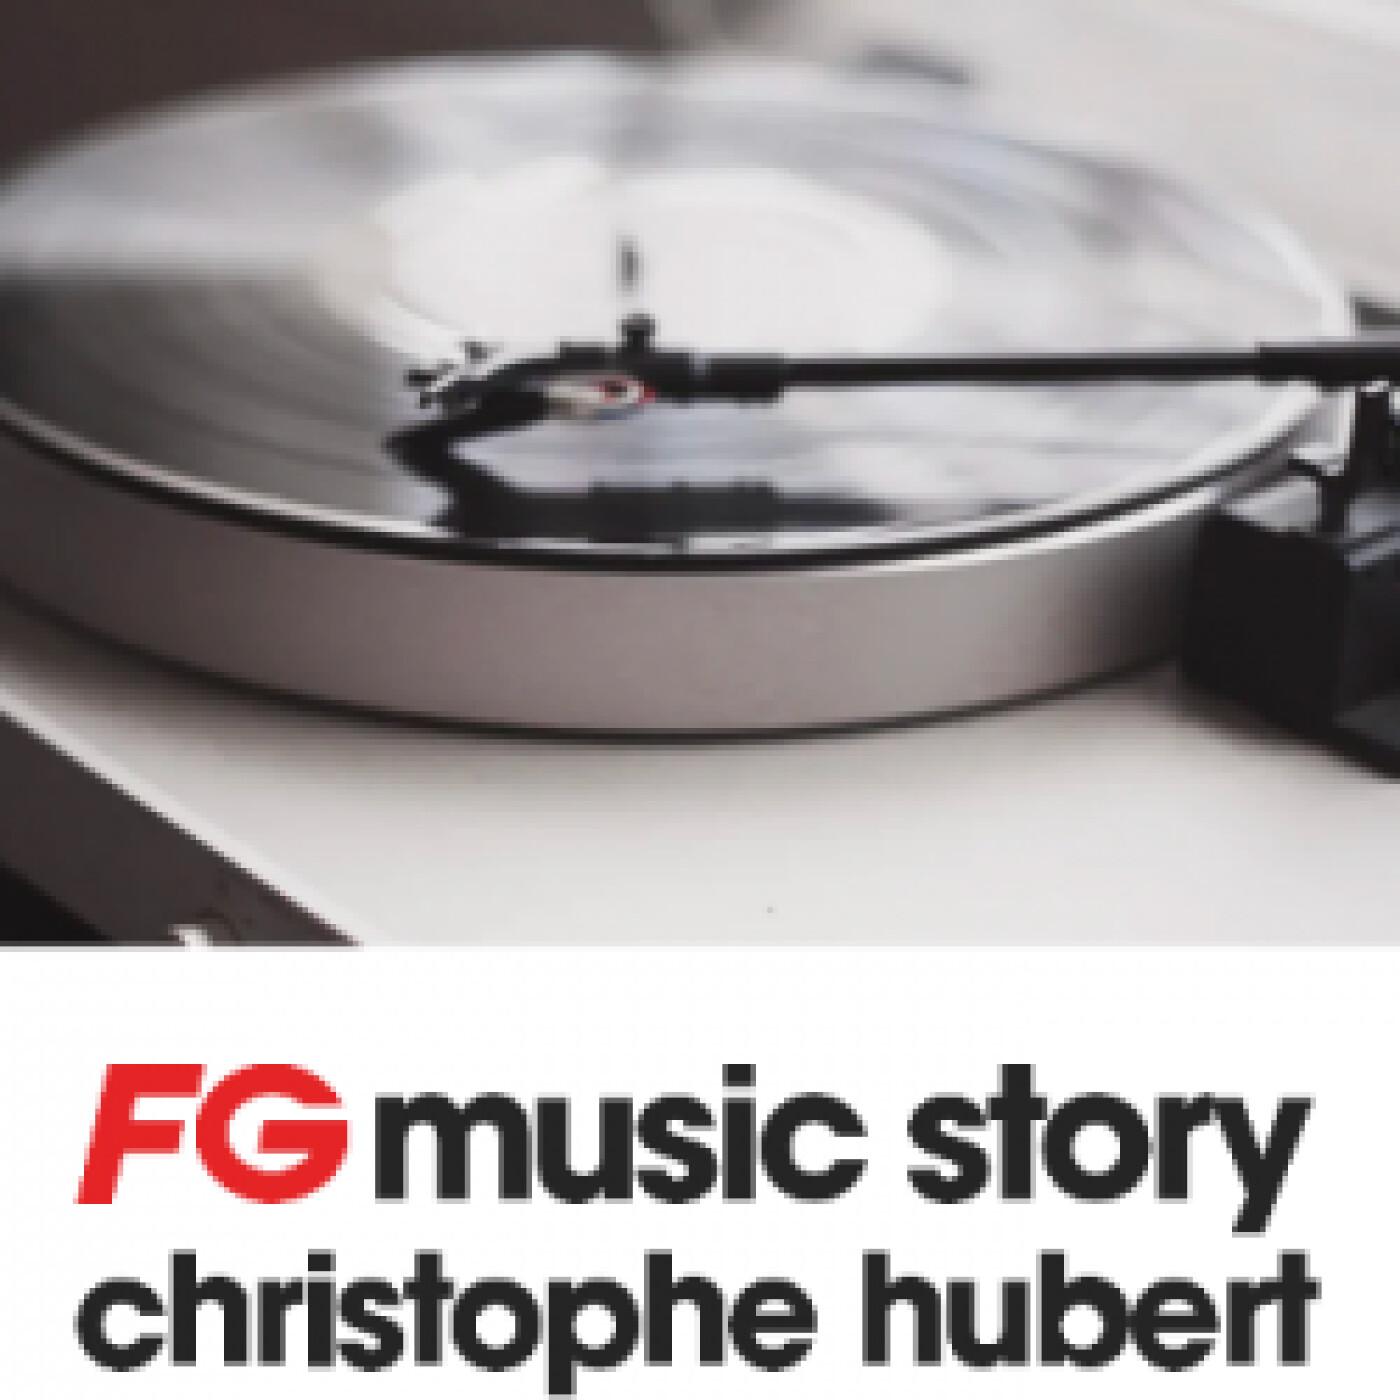 FG MUSIC STORY : BASEMENT JAXX